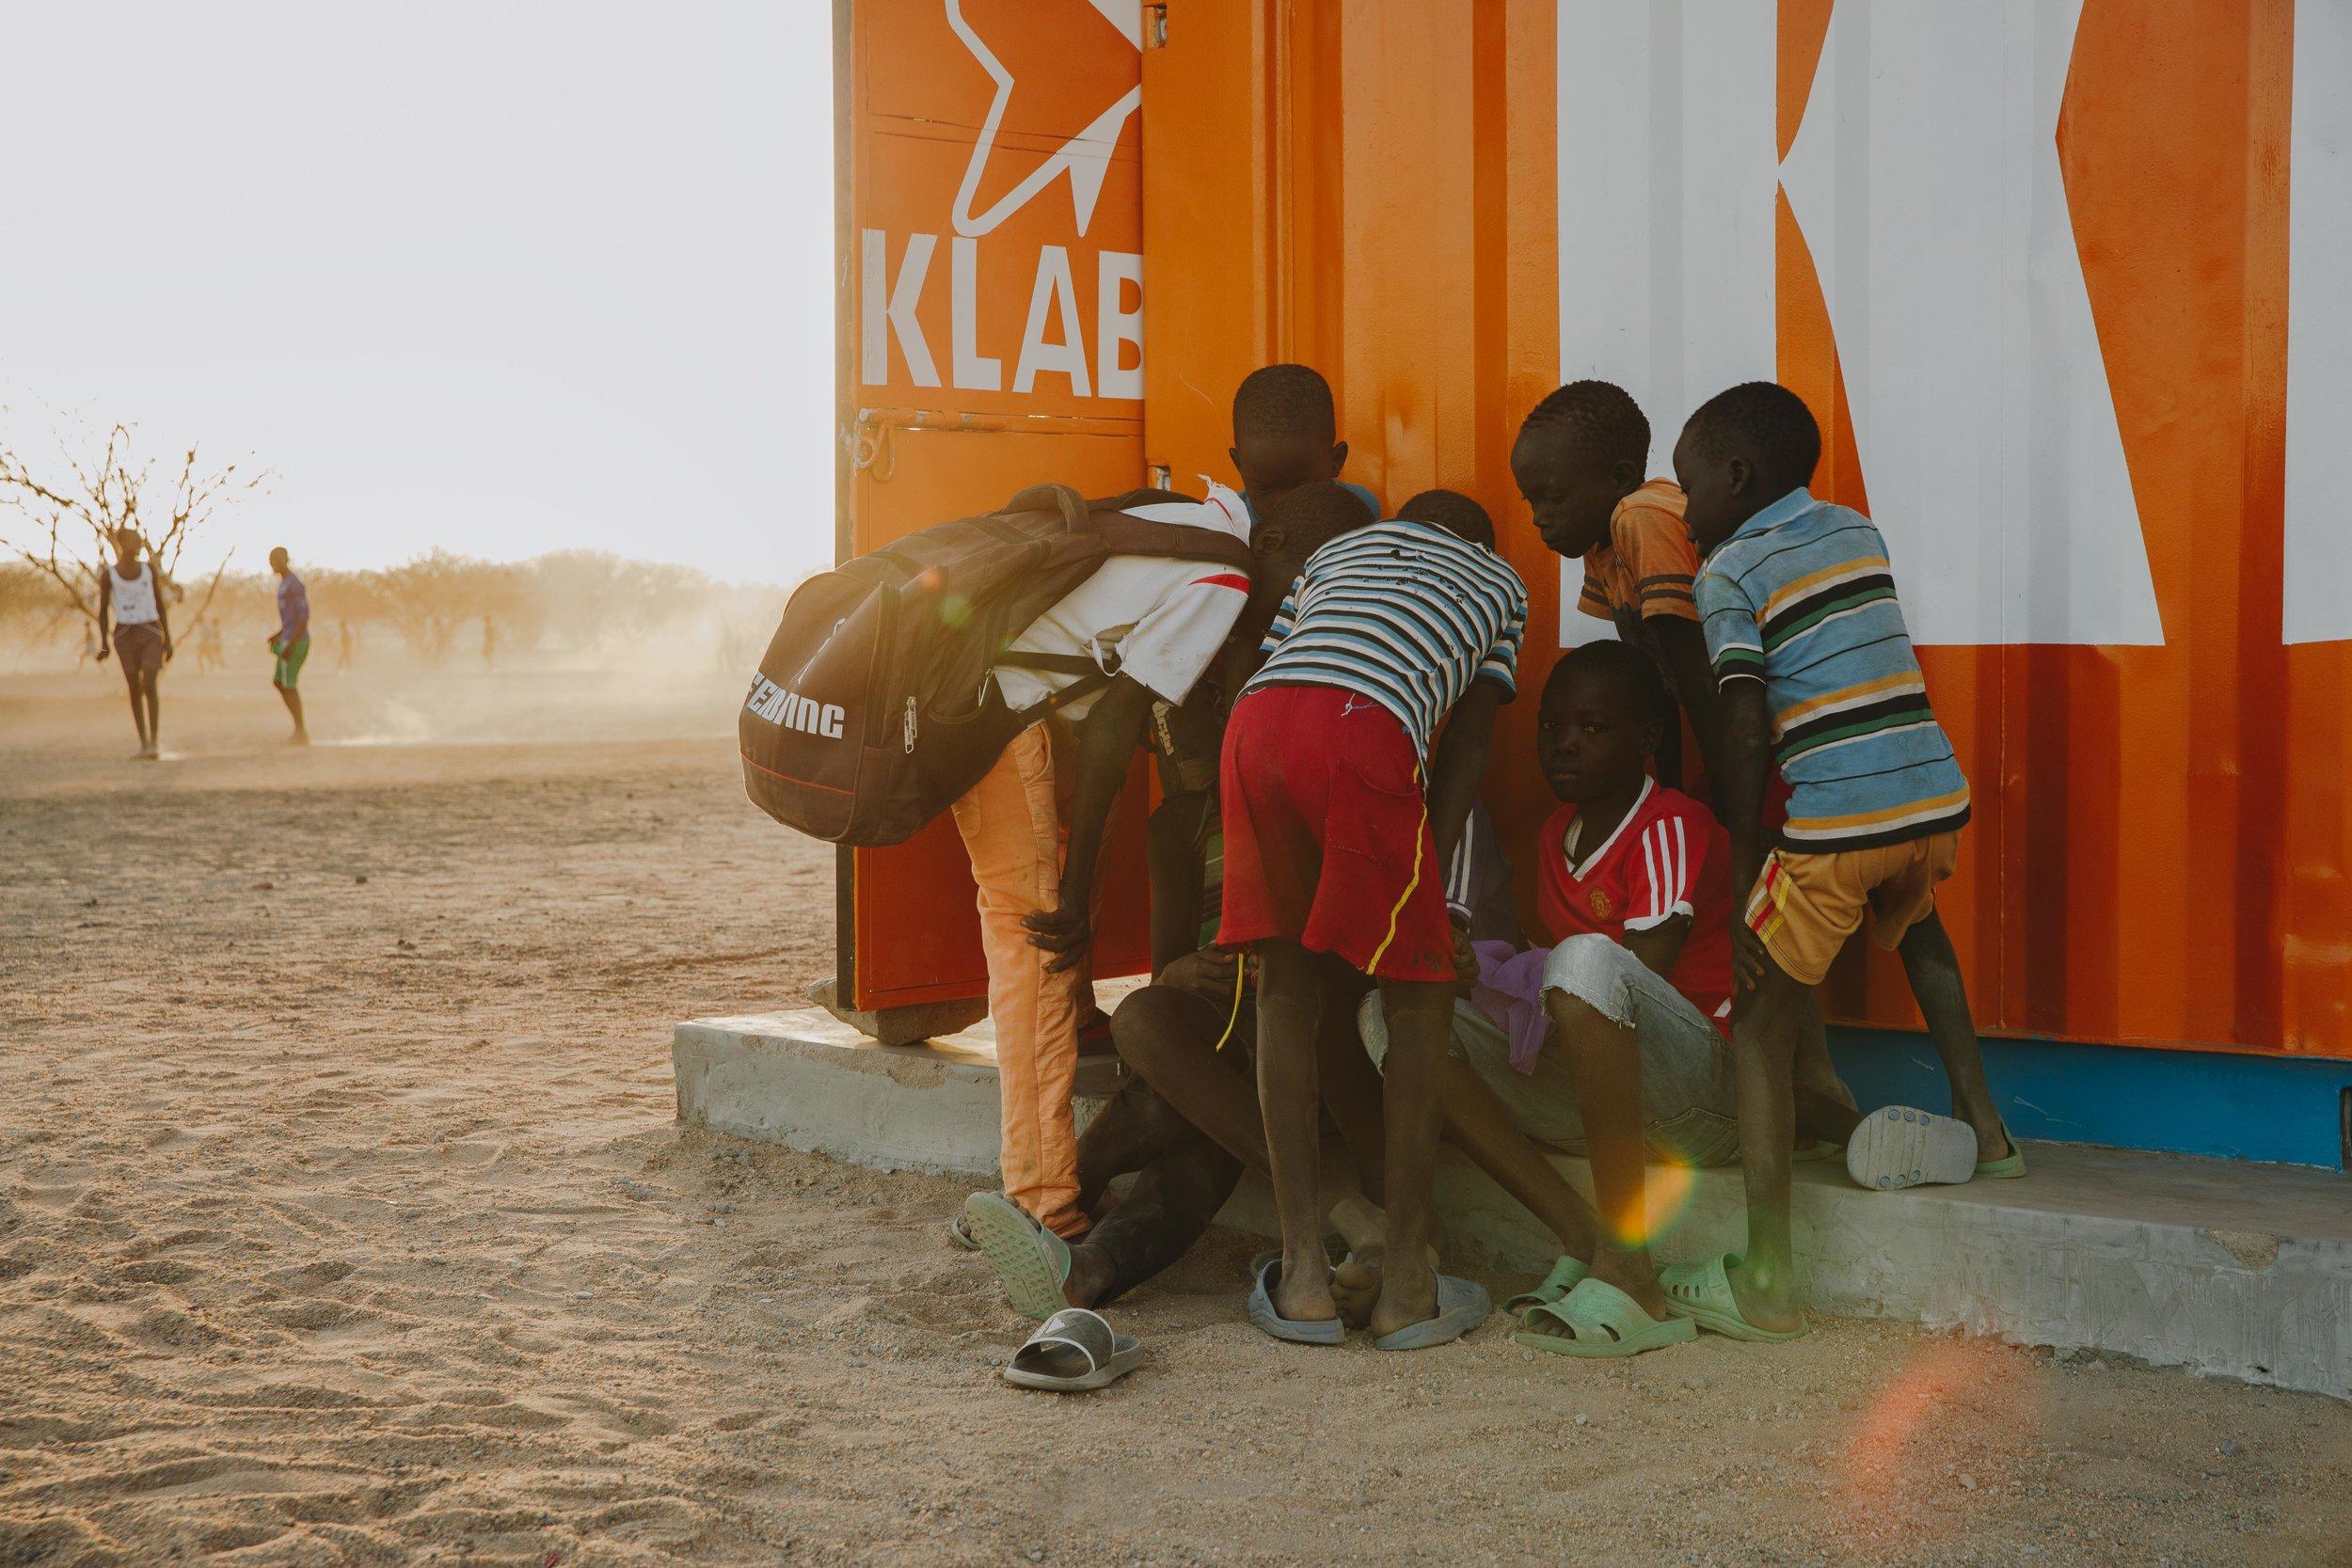 10_KLABU Campaign image _ by Coco Olakunle.jpg